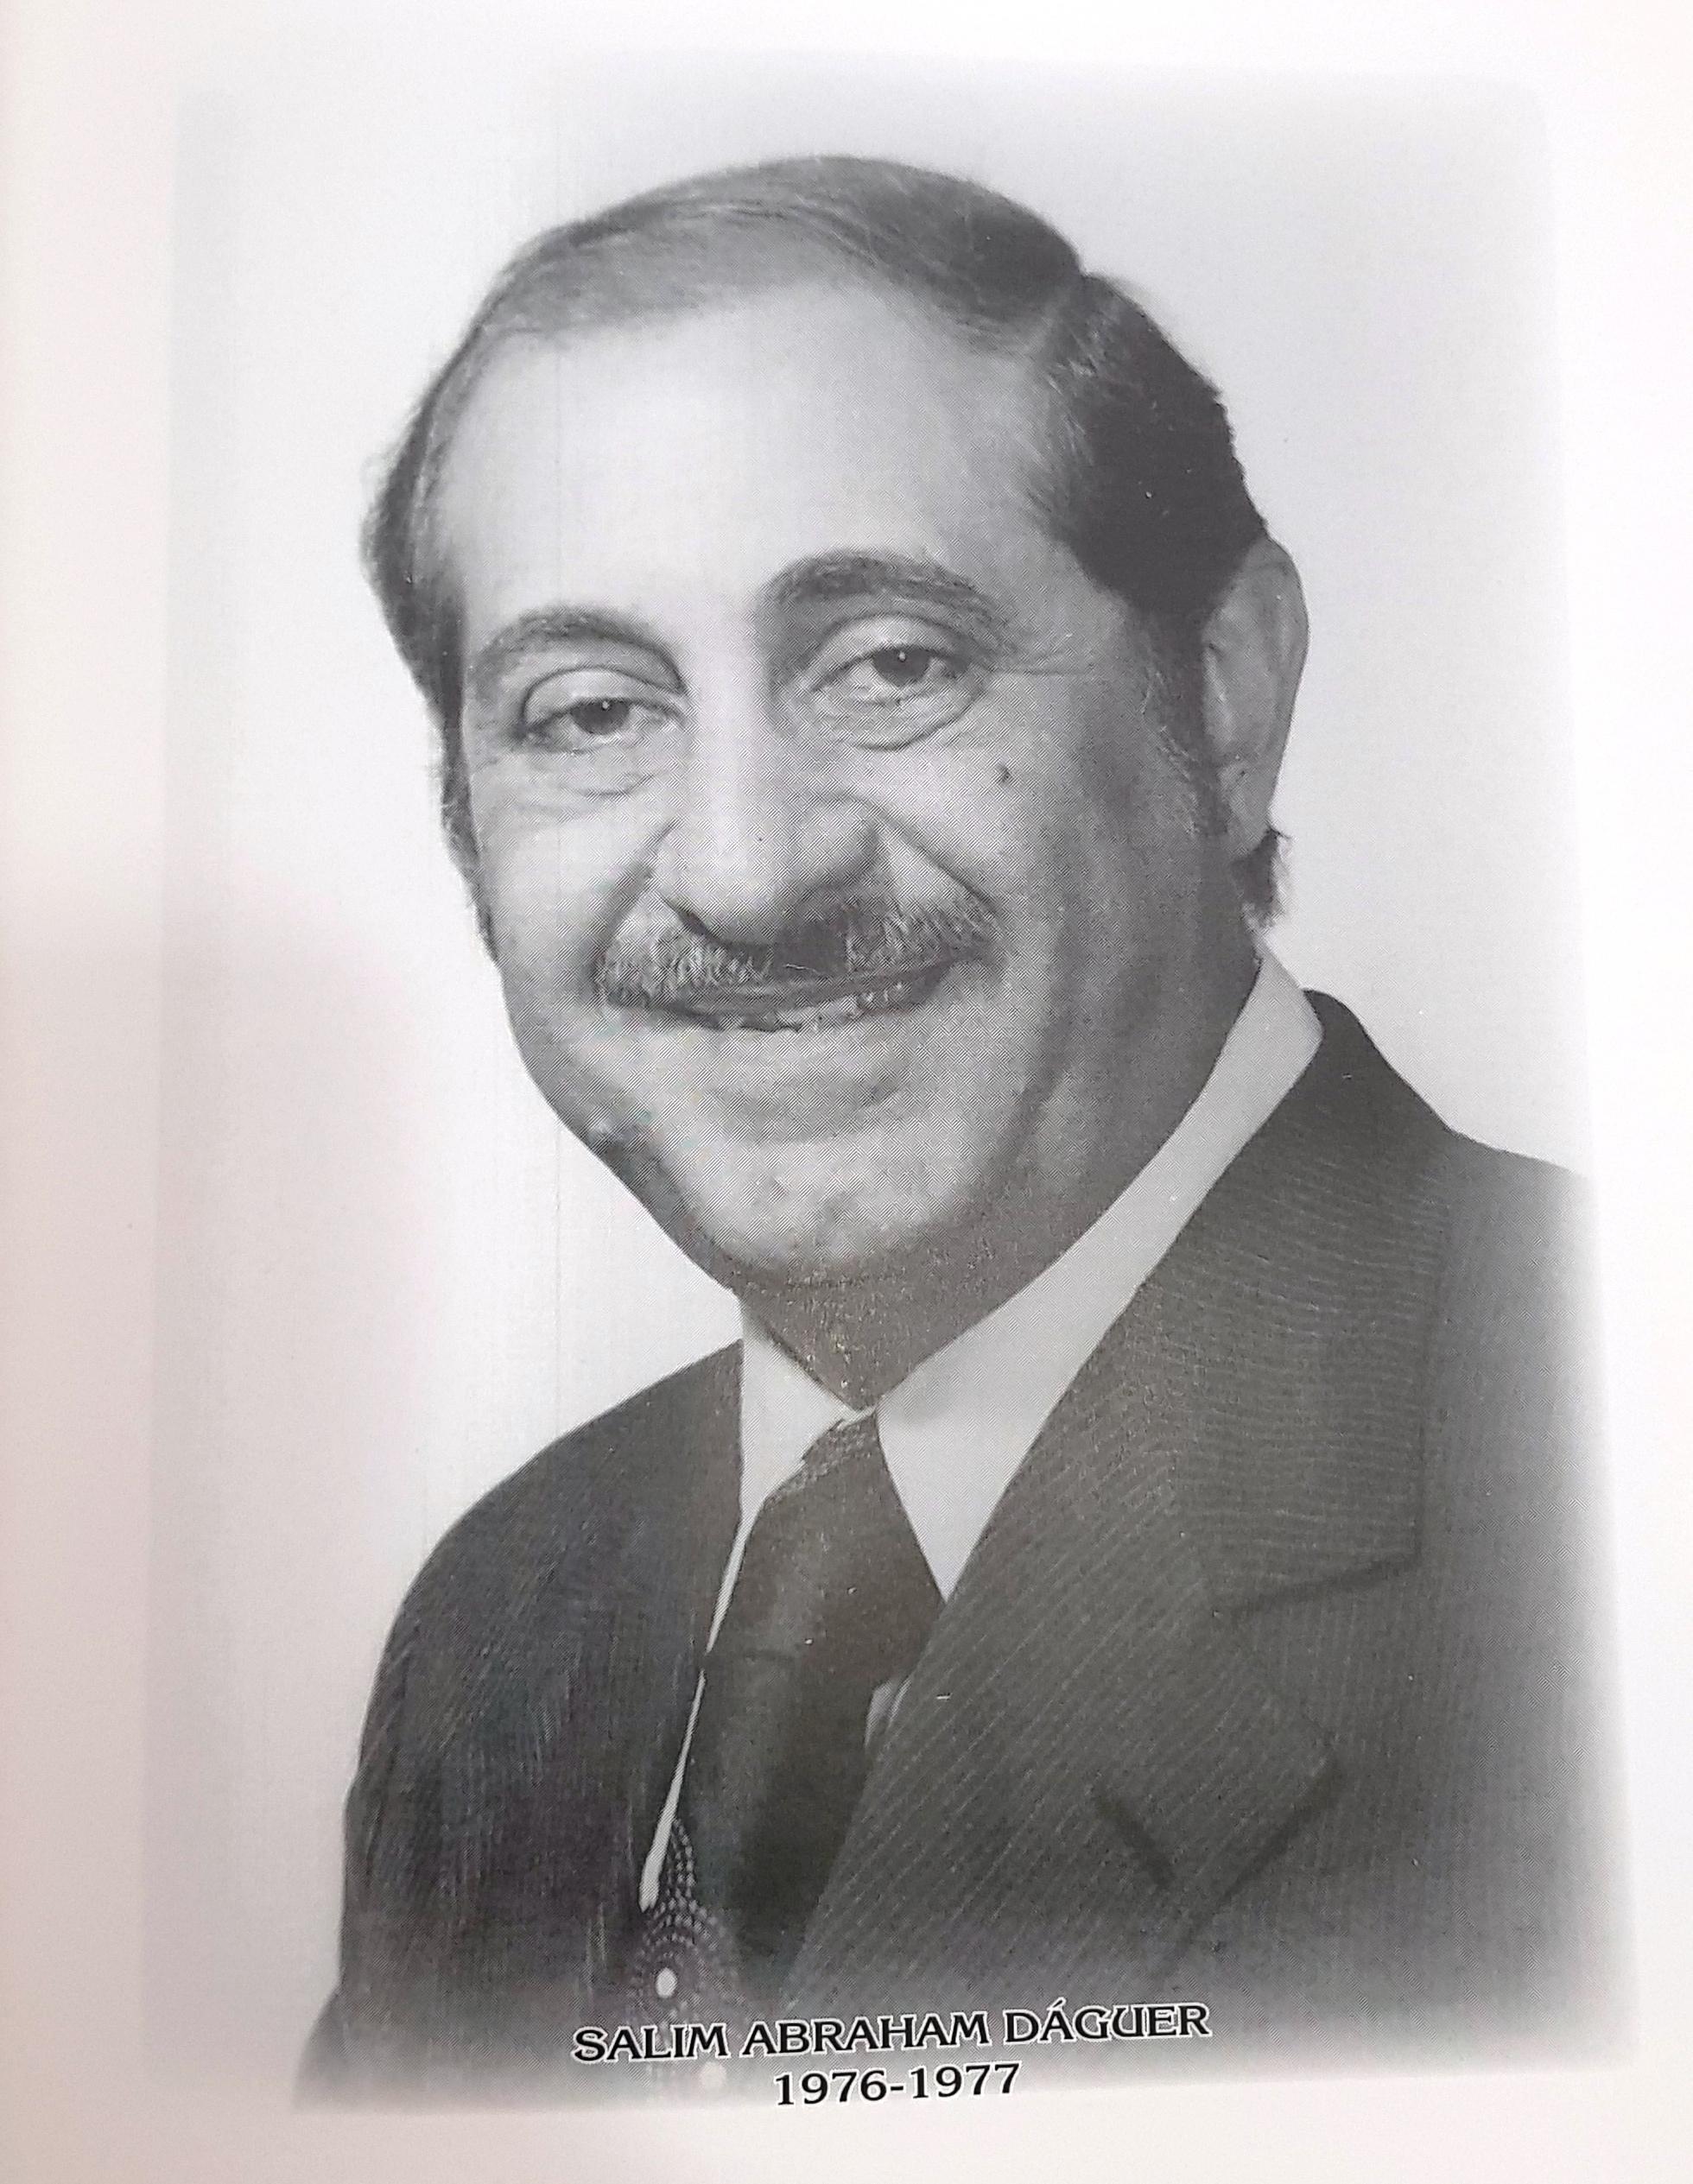 PRESIDENTE DE LA CÁMARA DE COMERCIO DE MÉRIDA SR. SALIM ABRAHAM DÁGUER